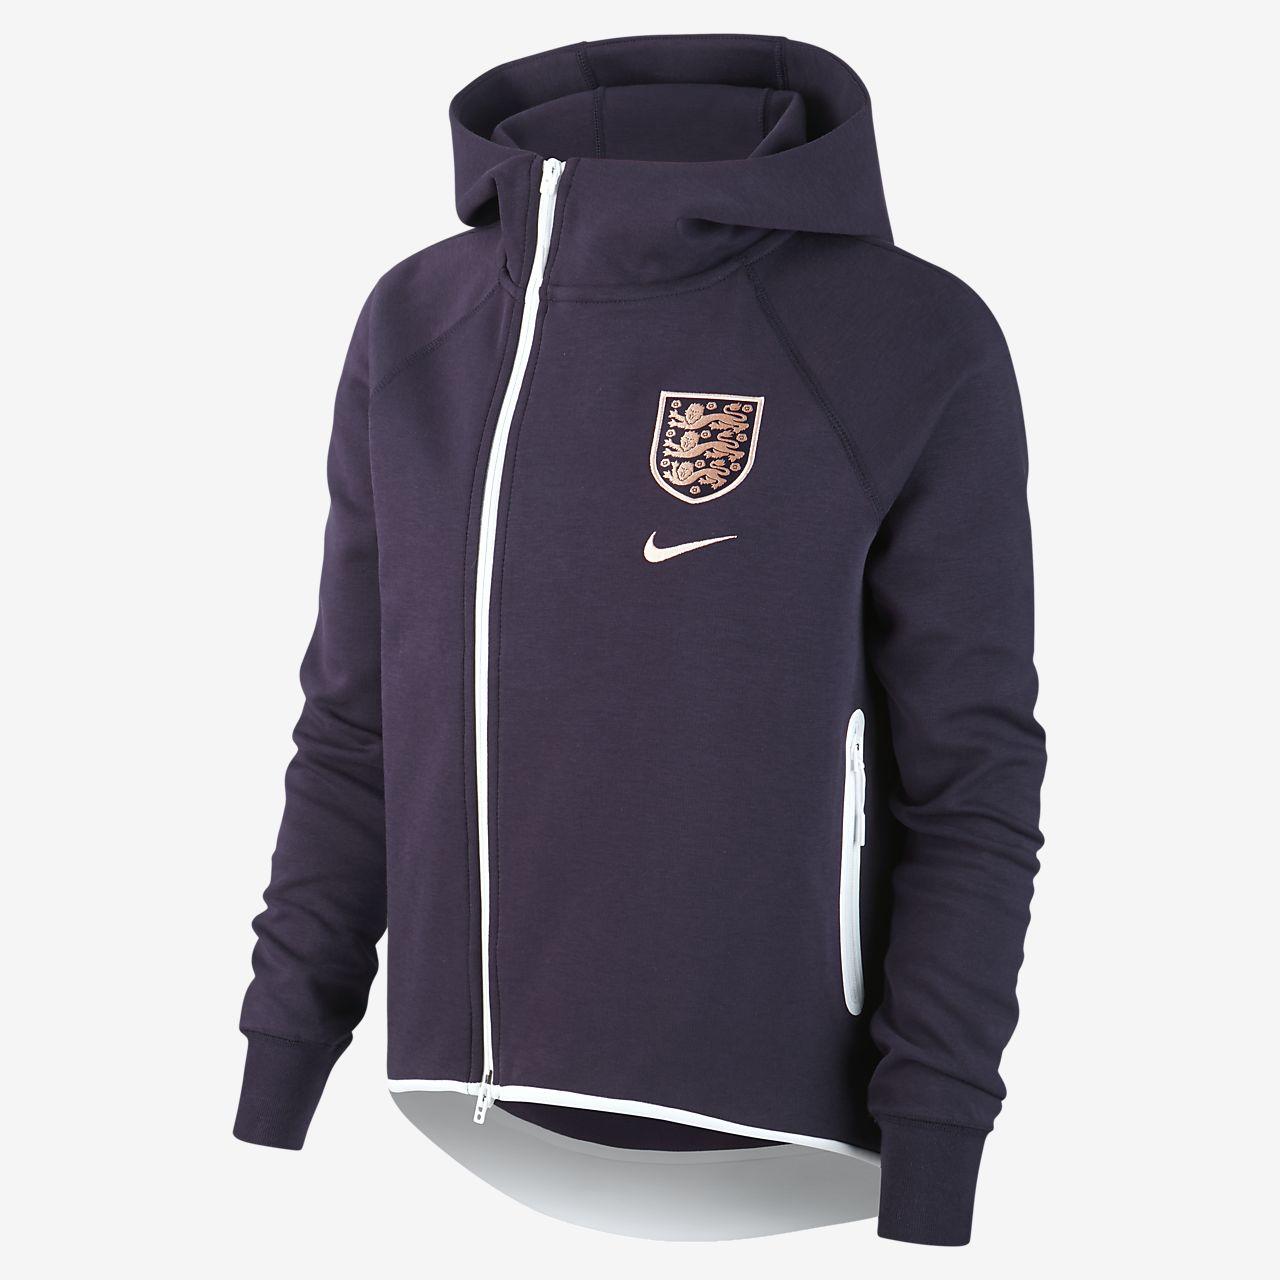 England Tech Fleece női futballpelerin